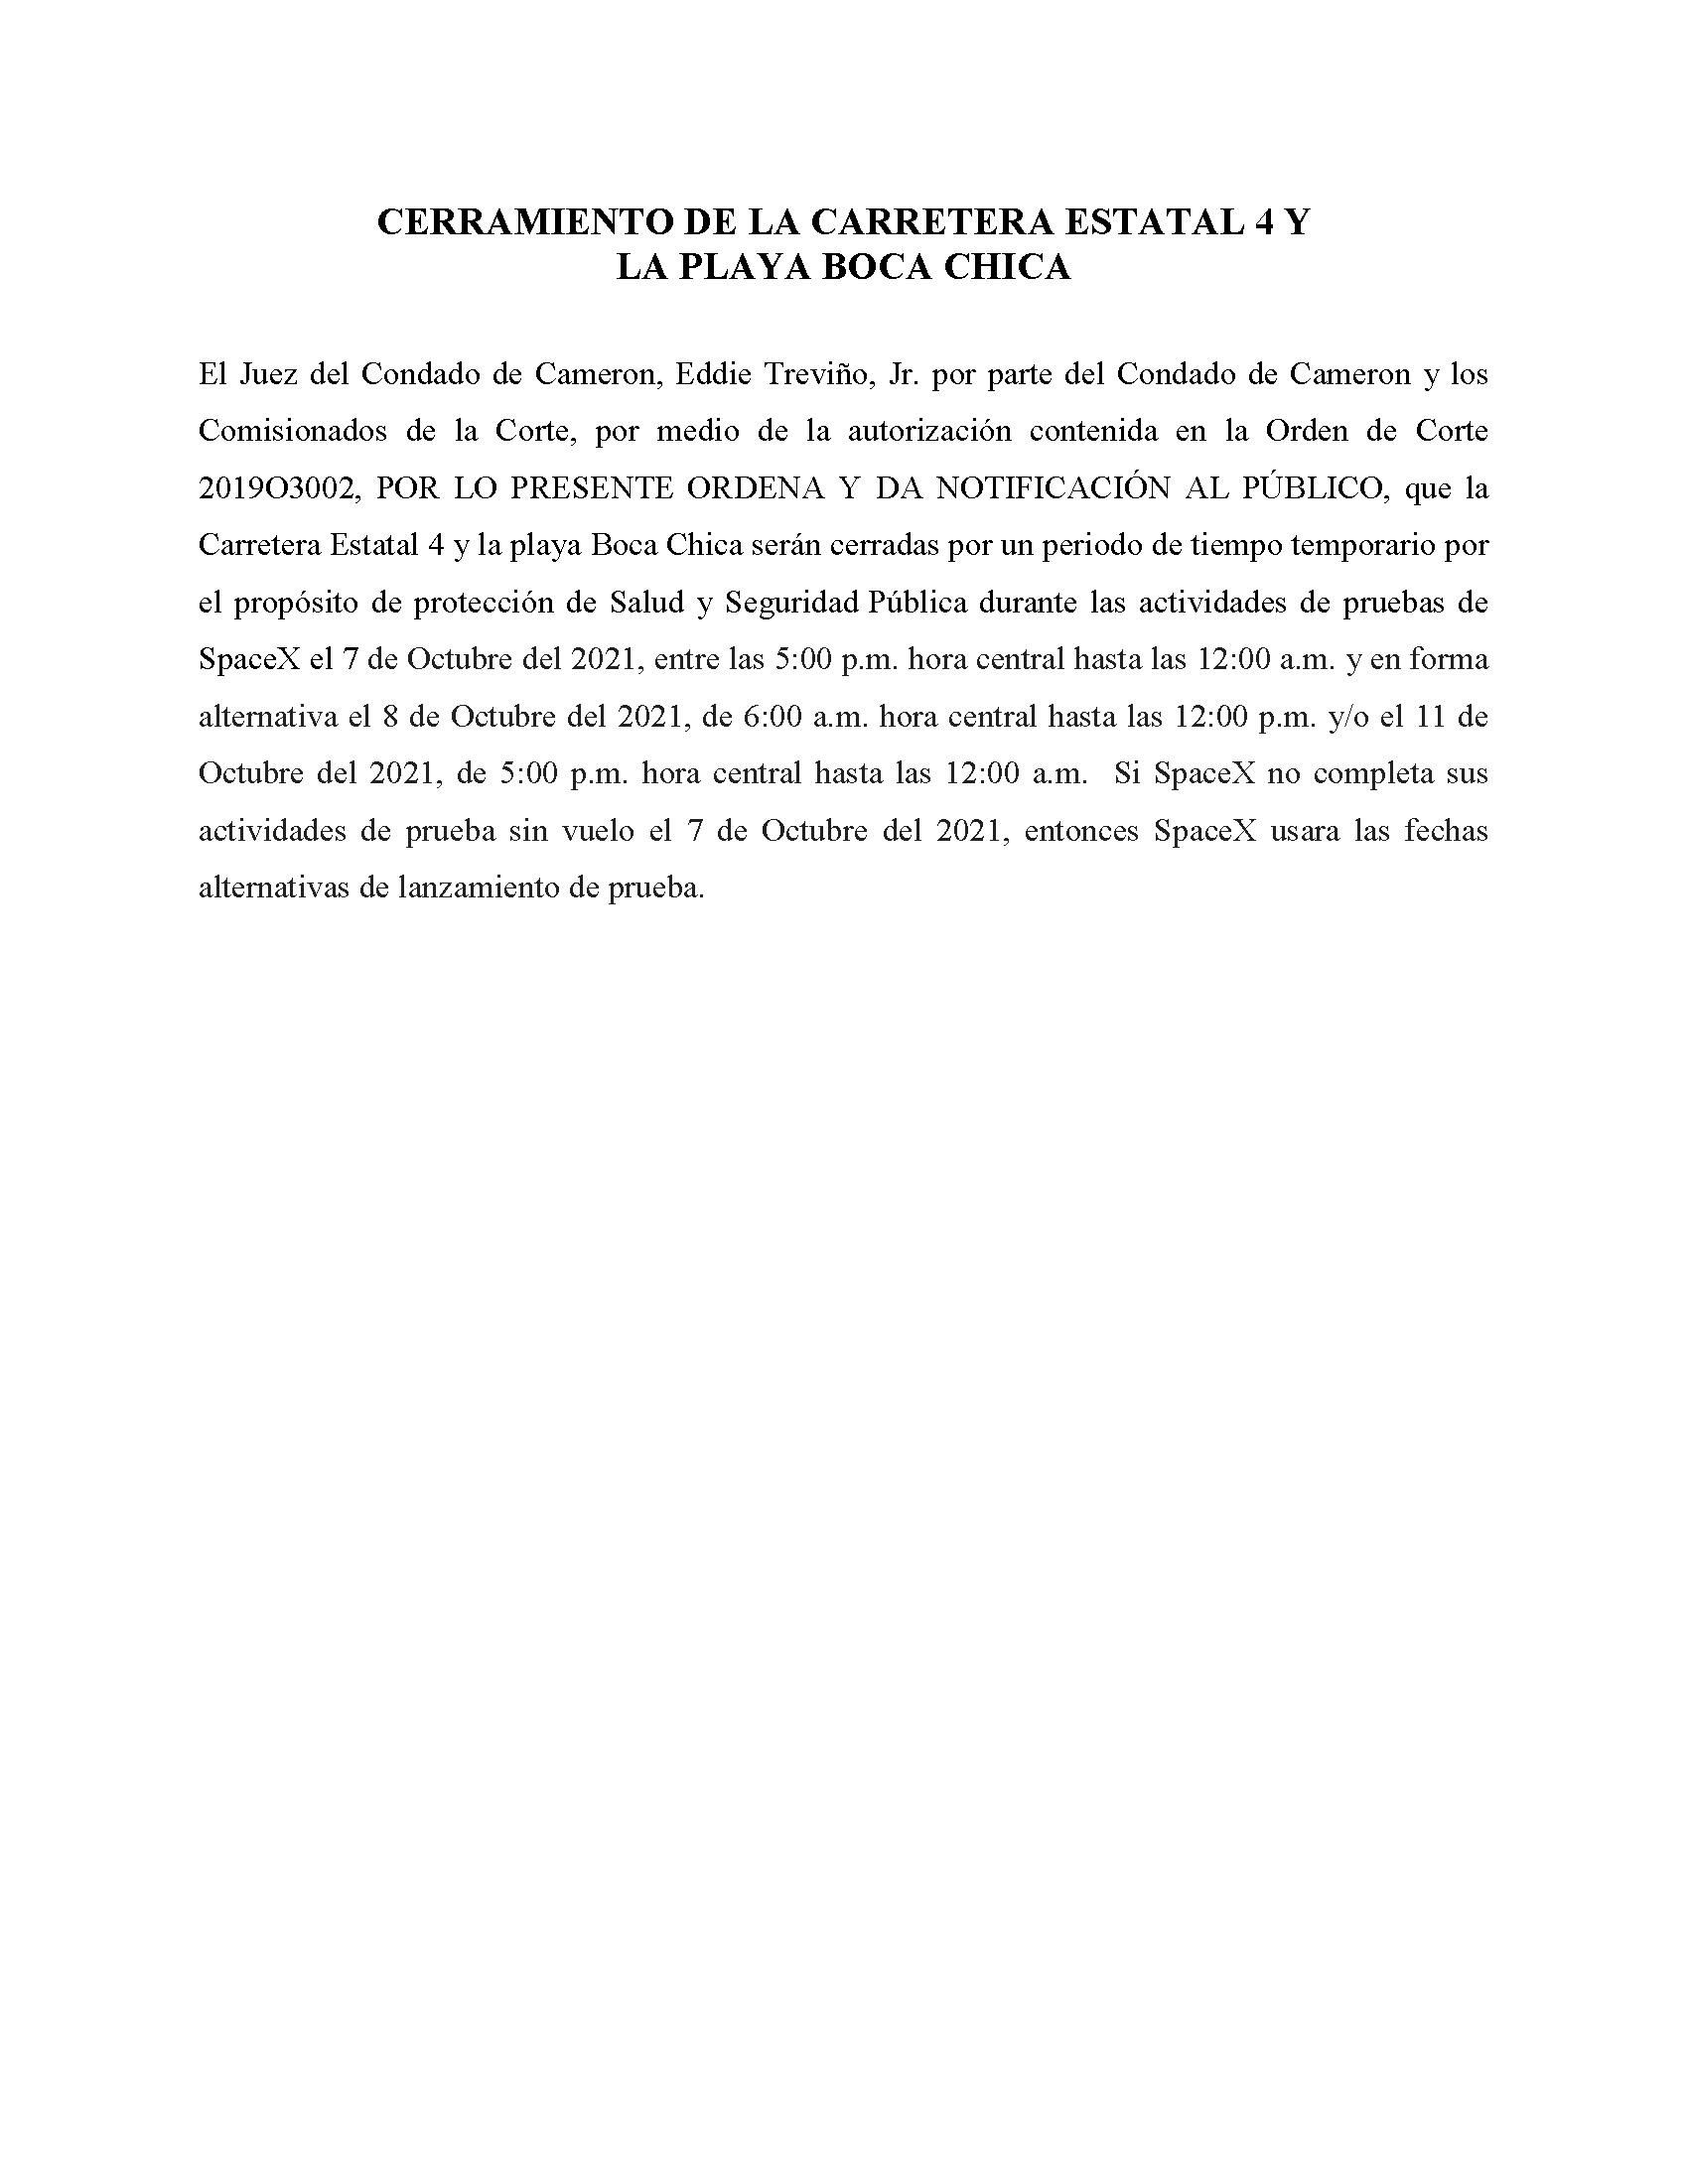 ORDER.CLOSURE OF HIGHWAY 4 Y LA PLAYA BOCA CHICA.SPANISH.10.07.2021